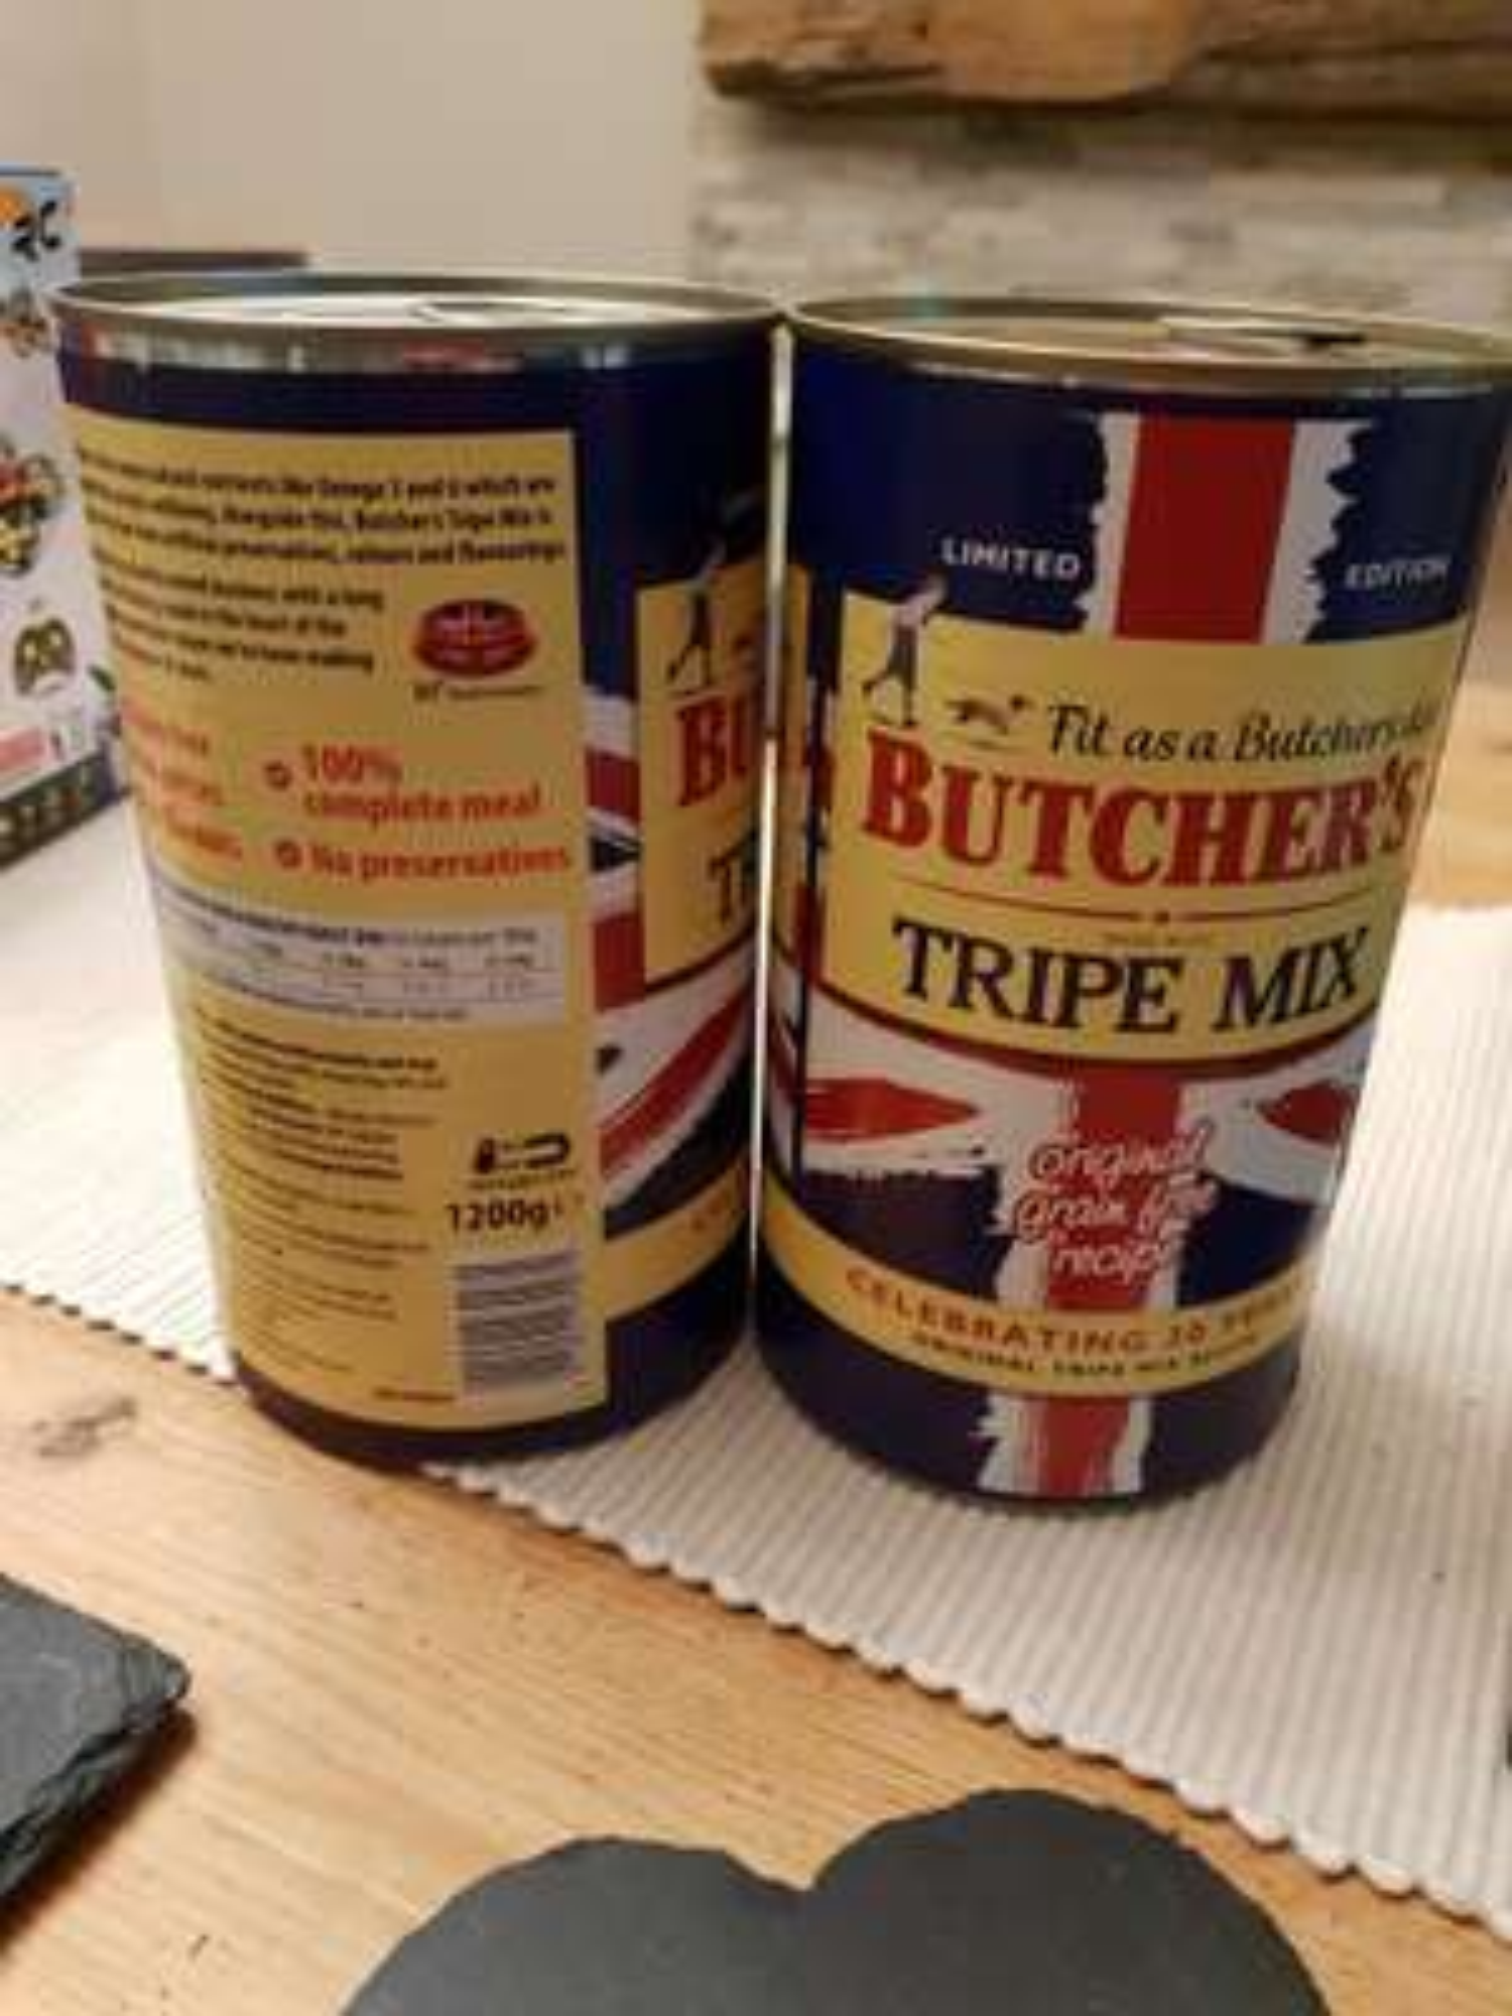 Butcher's Tripe Mix Dog Food 1200g - £1 instore @ Morrisons